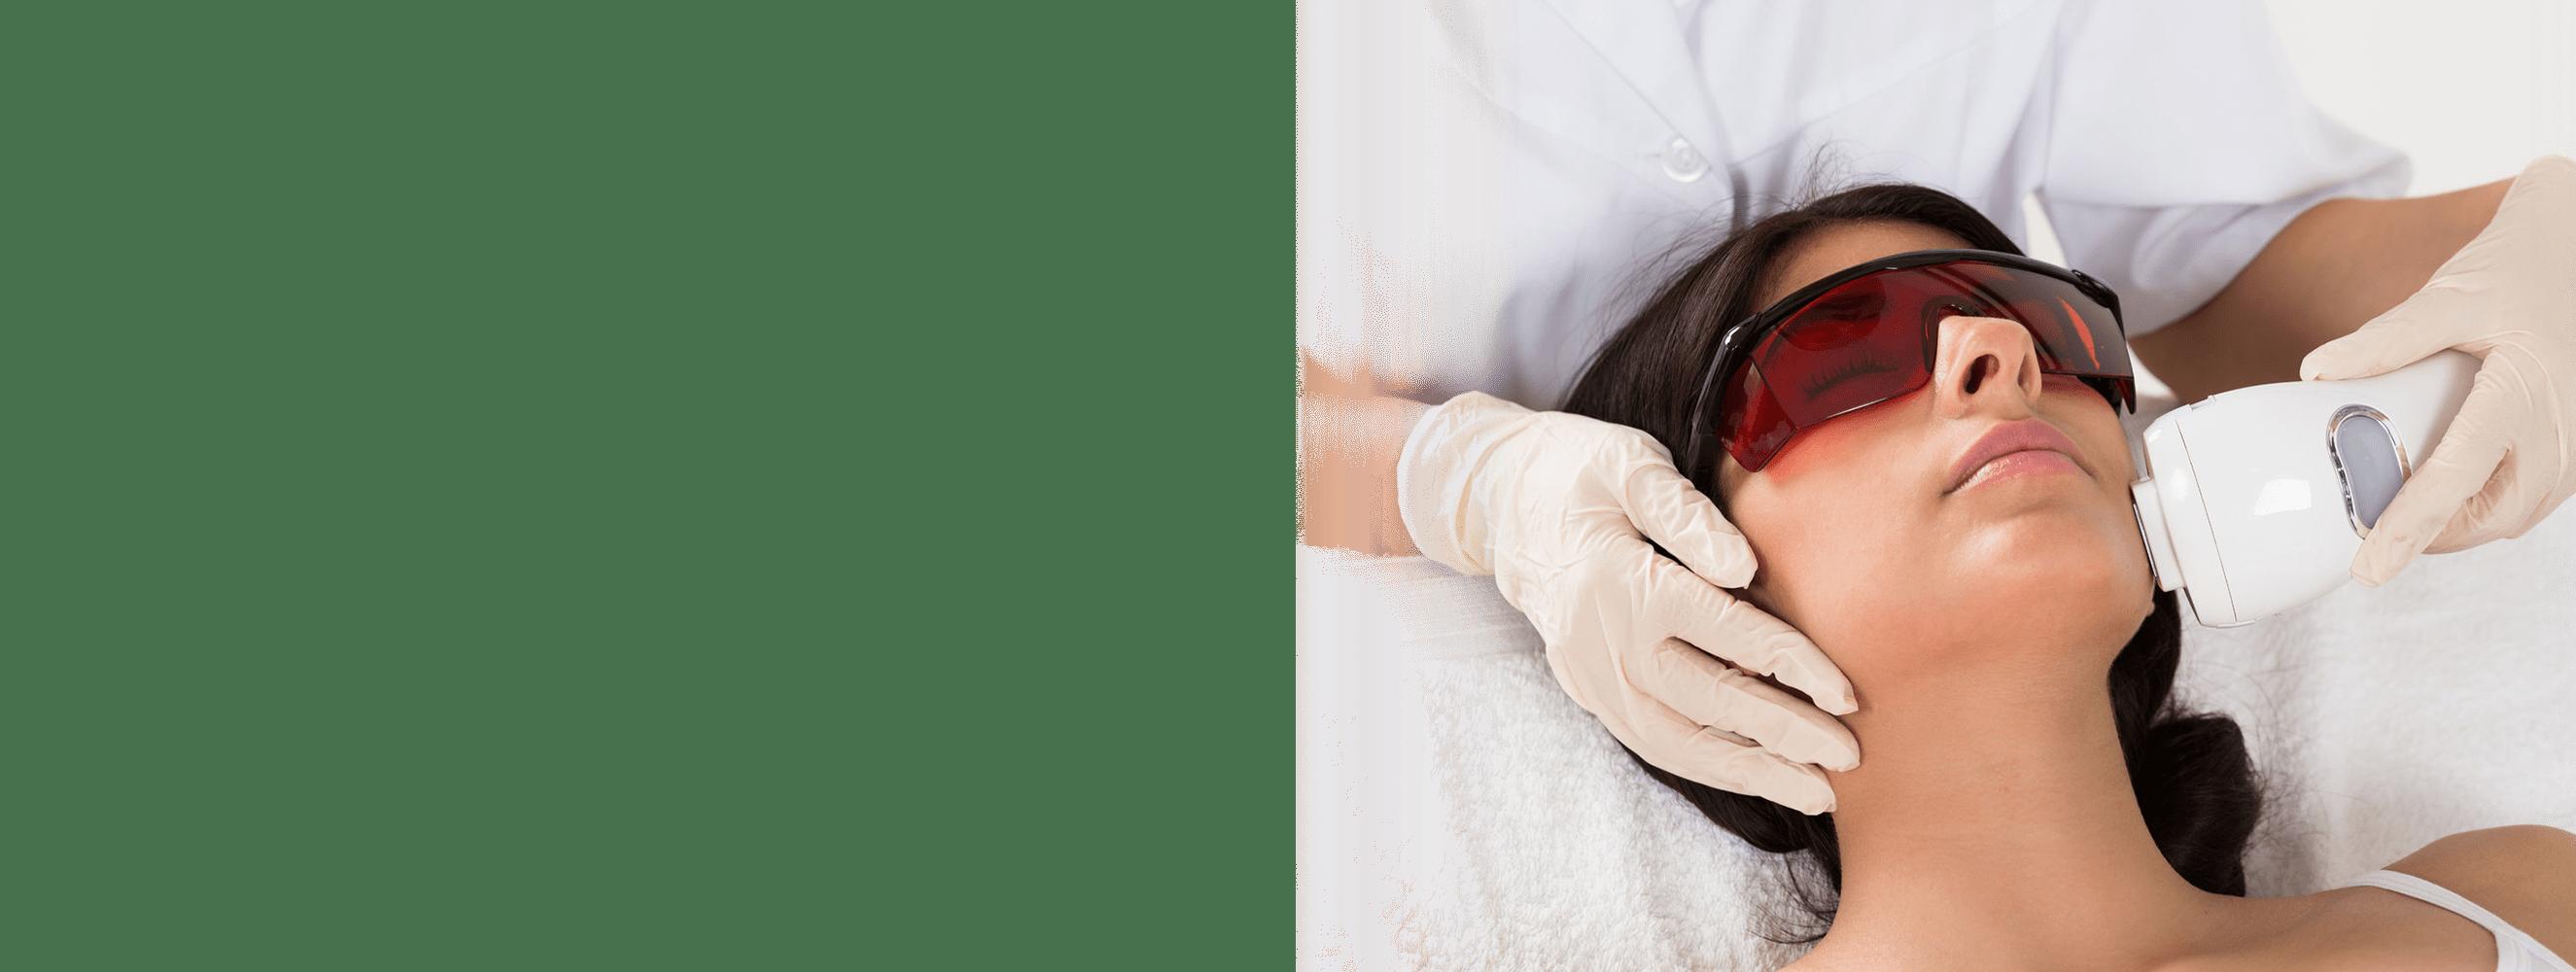 premier-clinic-banner